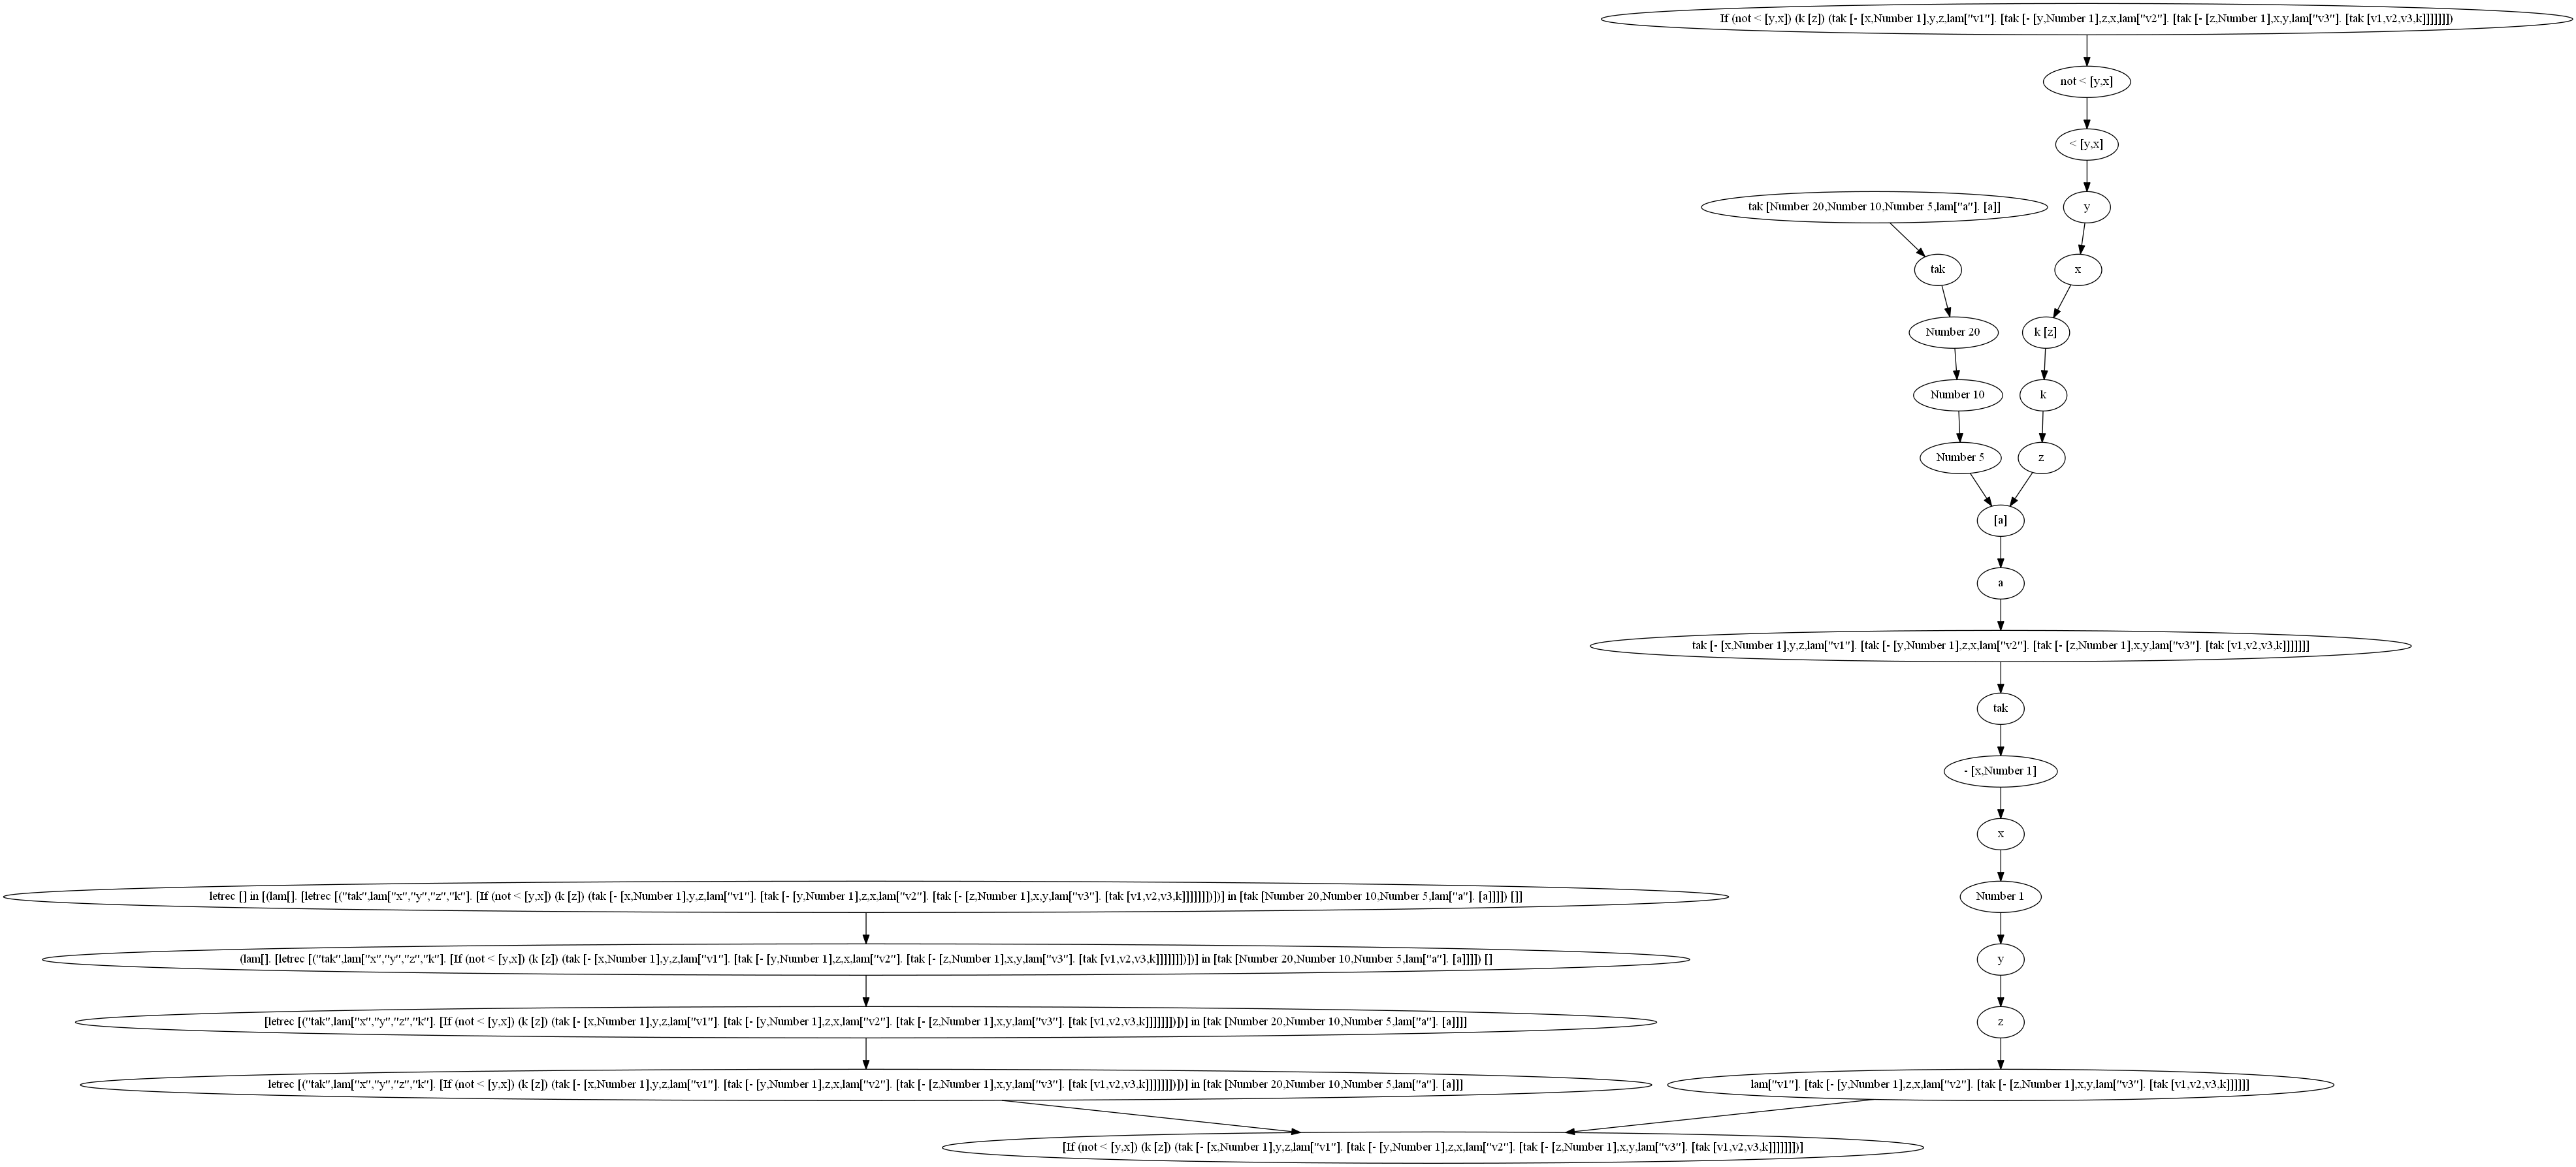 scheme/graph_files/gabriel/cpstak.png